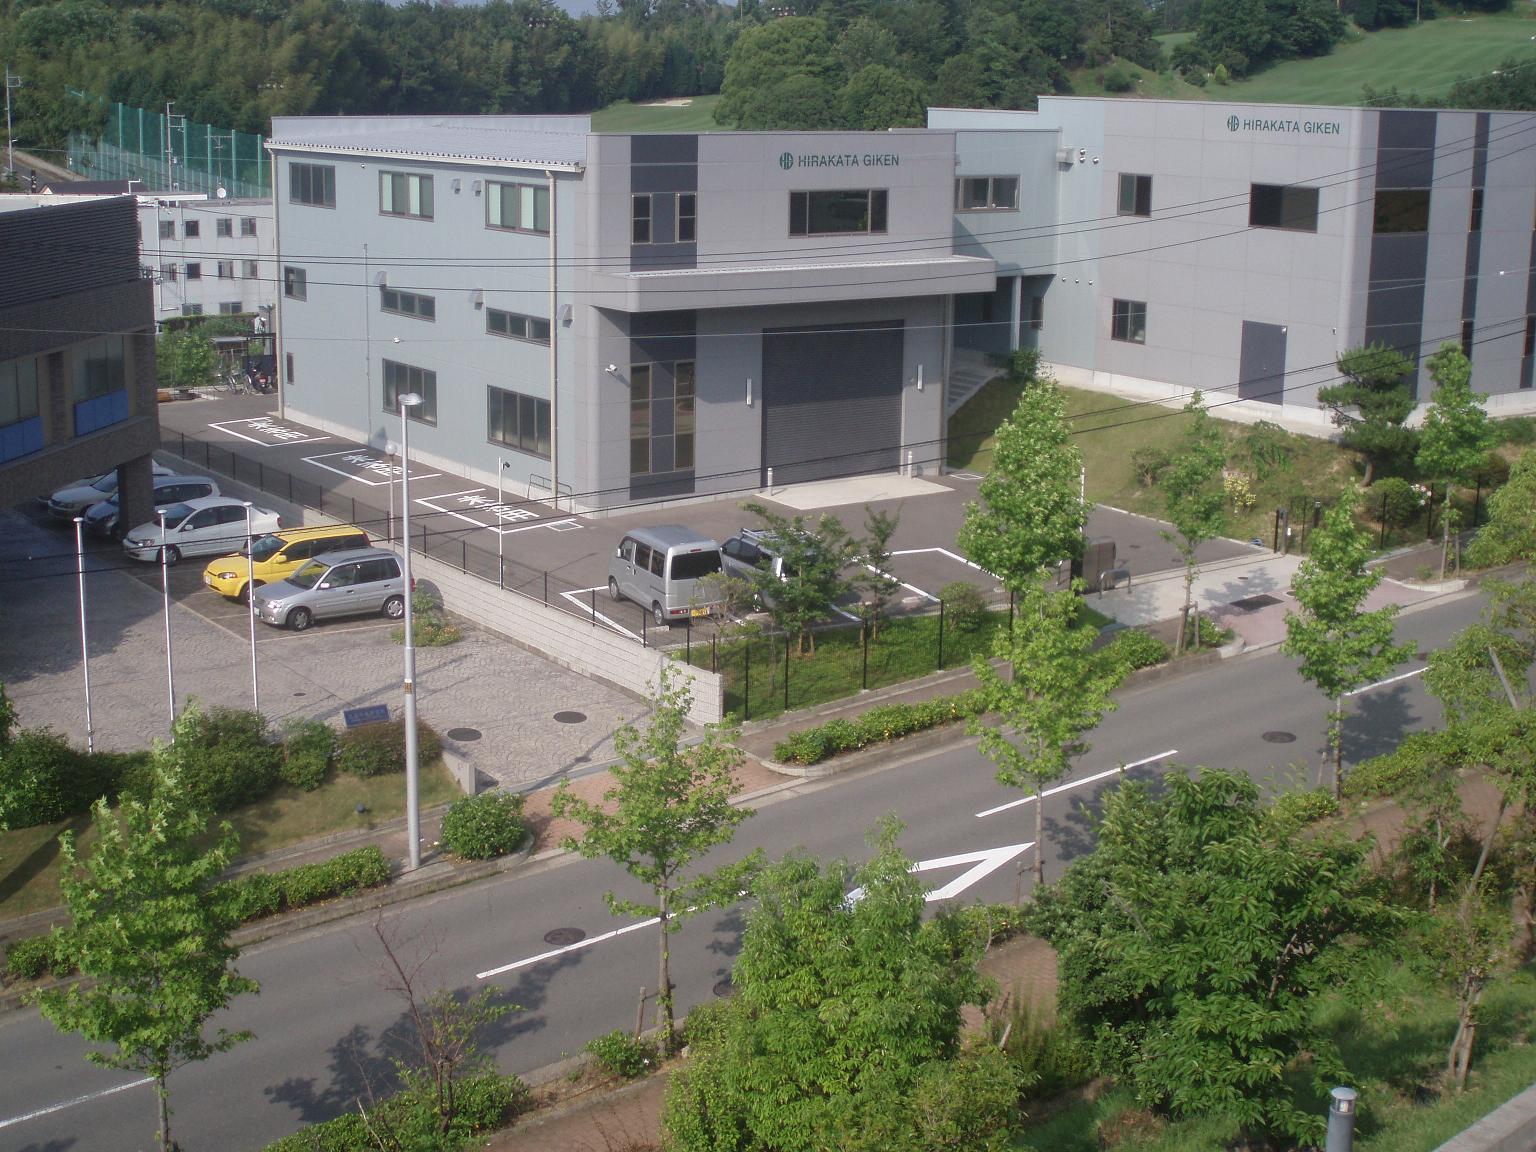 http://www.mlit.go.jp/crd/daisei/daikan/tsudasciencehills.jpg